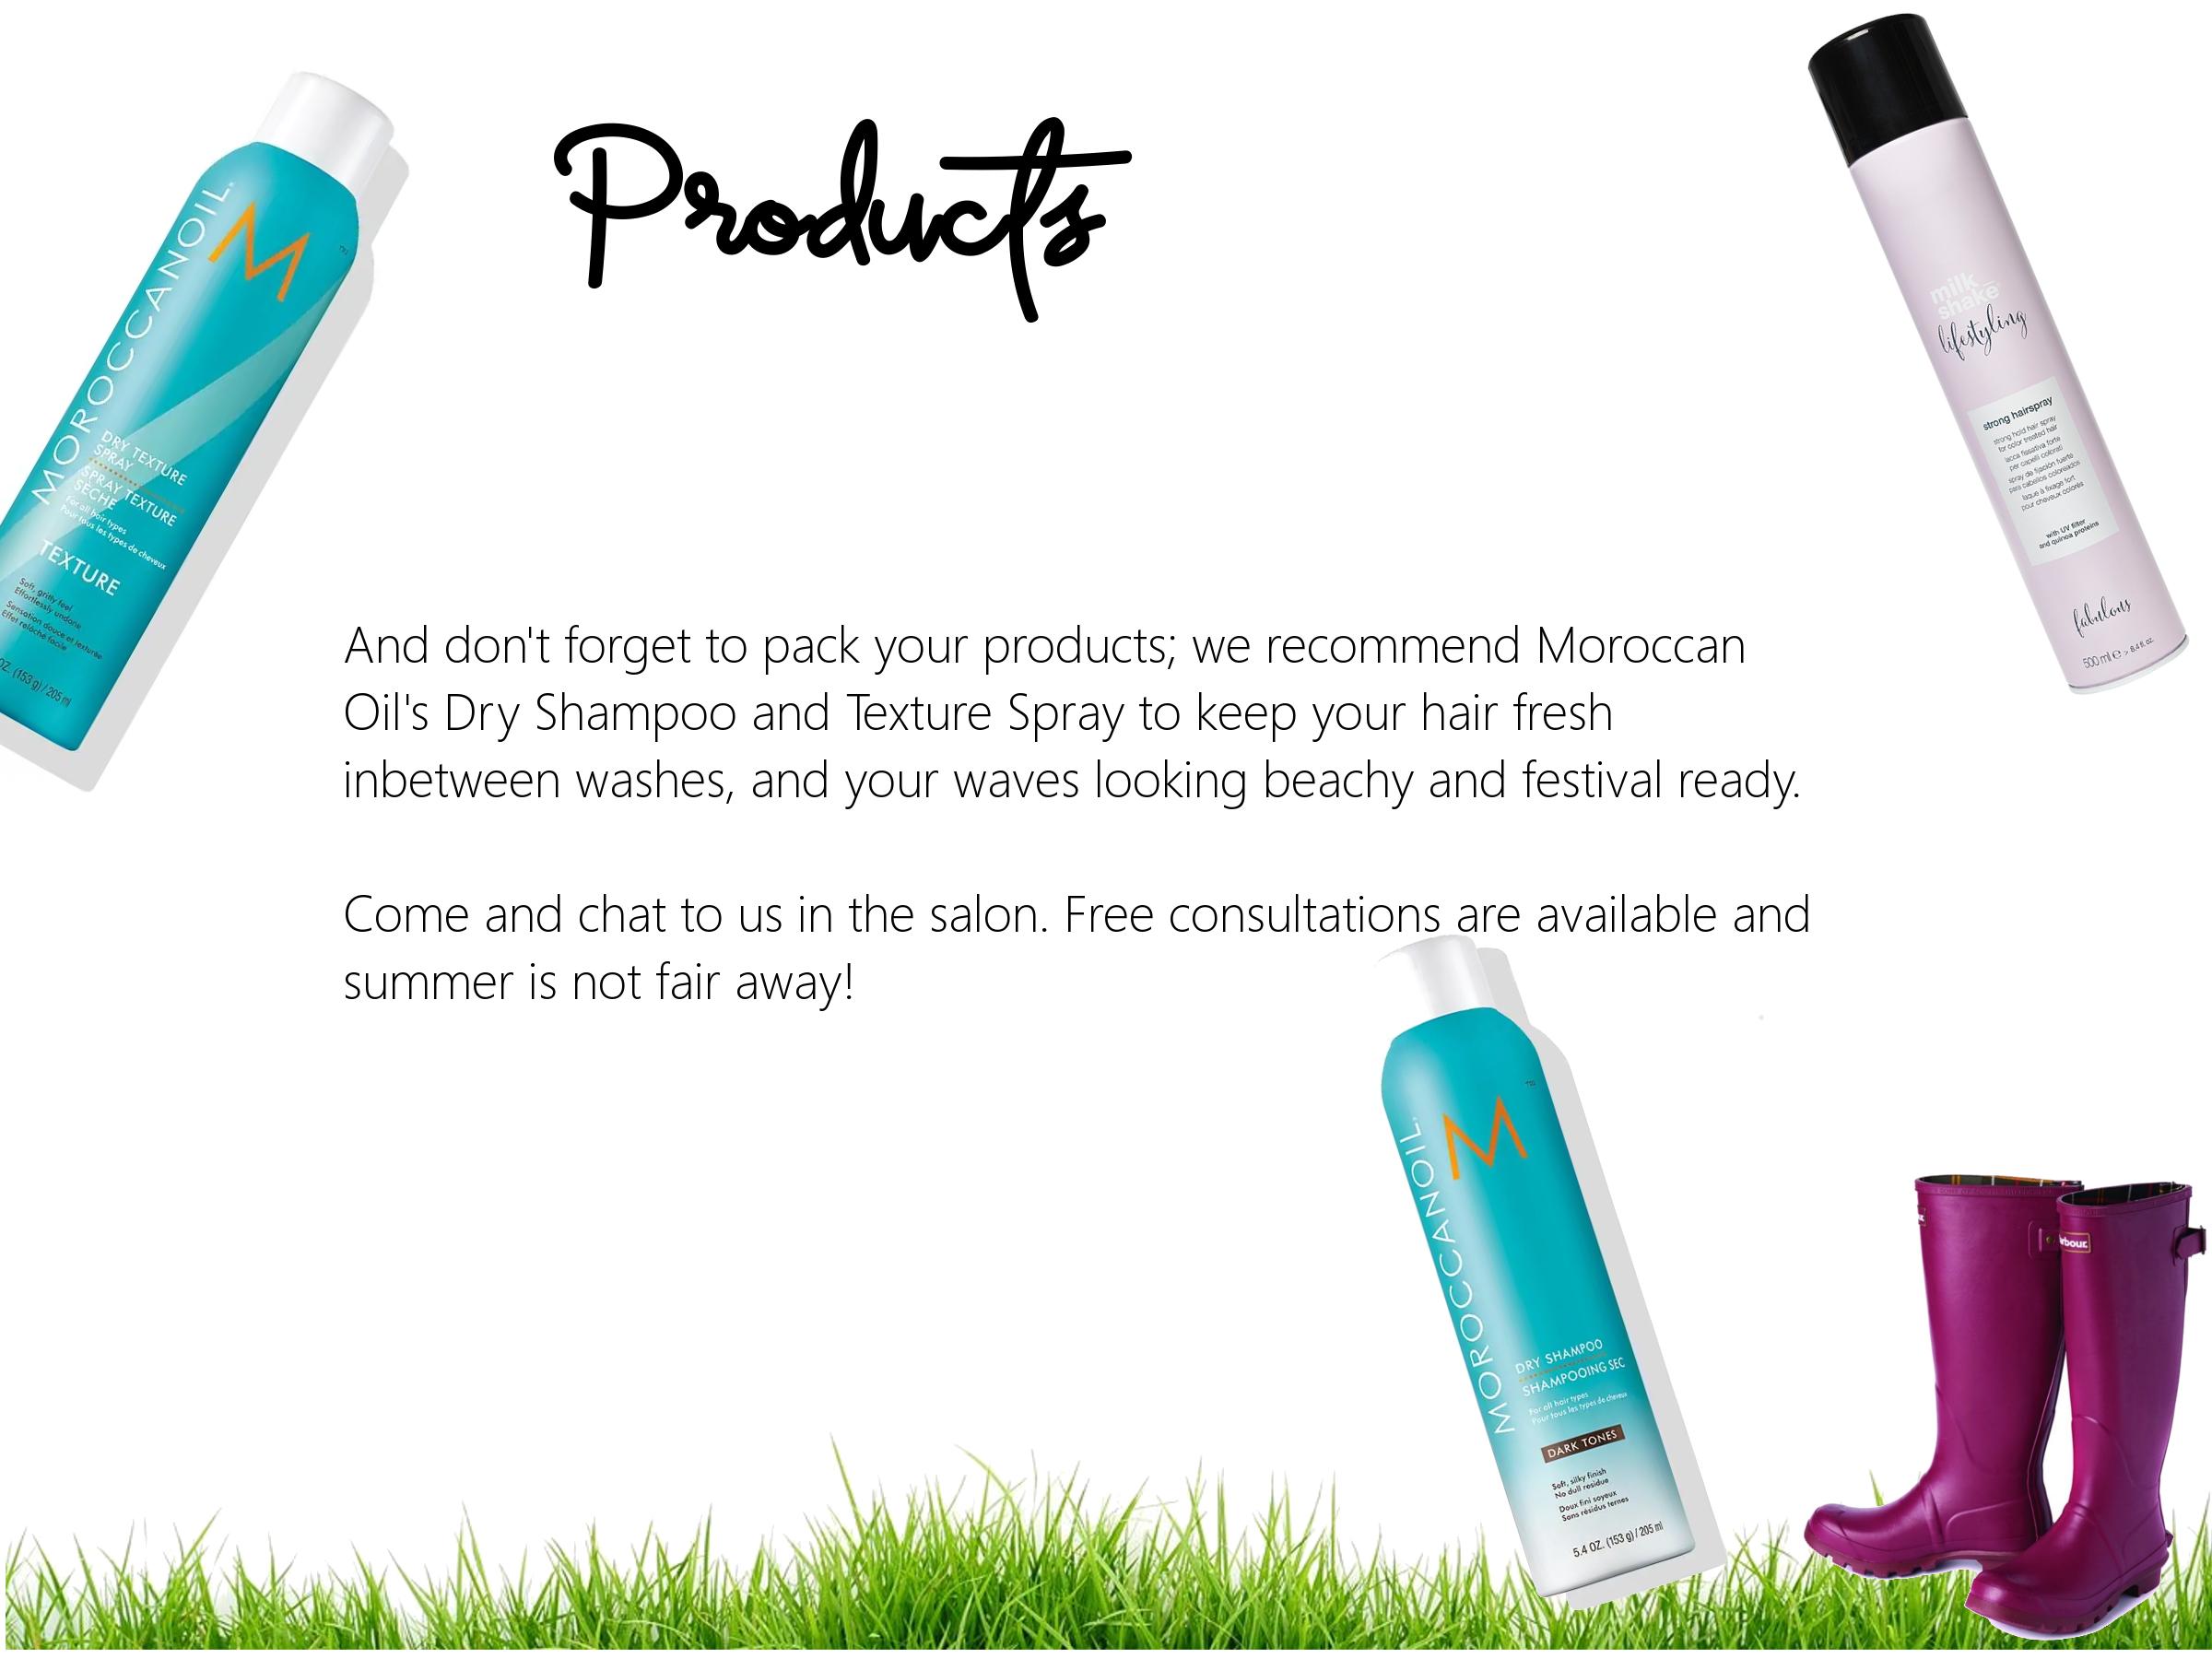 Venus-Beauty-Hair-Tavistock-Devon-Salon-Hairstylists-Festival-Summer-Braids-Colours-Milkshake-Moroccan-Oil-Styling-Products.png